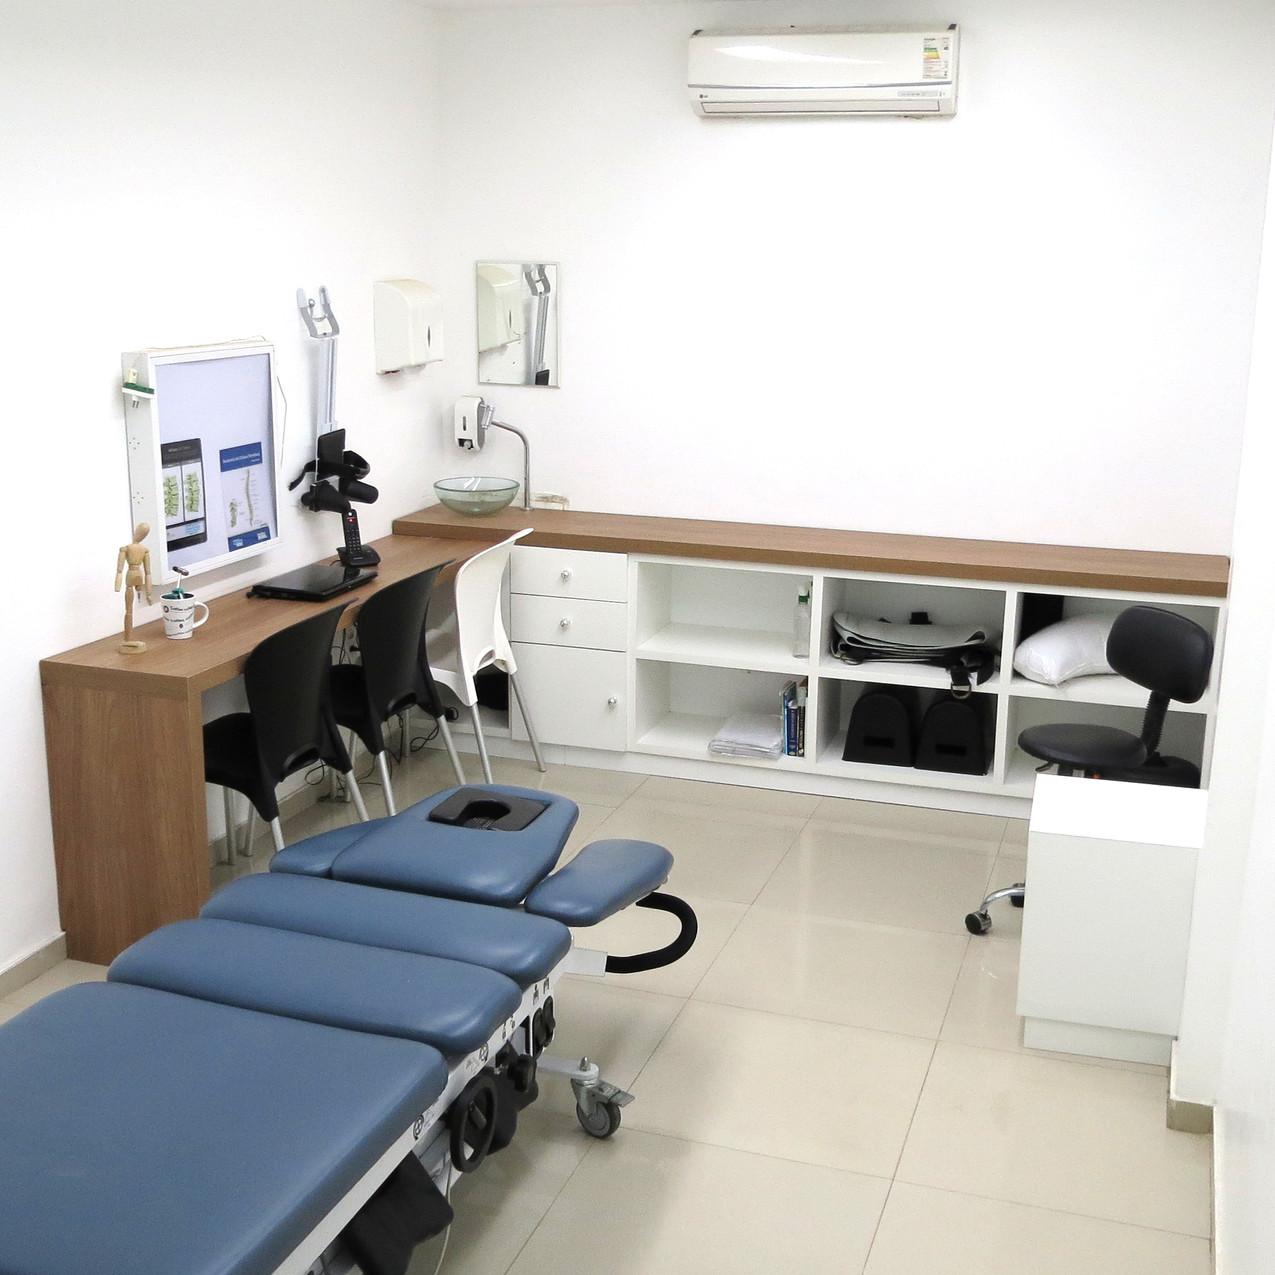 Clinica de fisioterapia em fortaleza